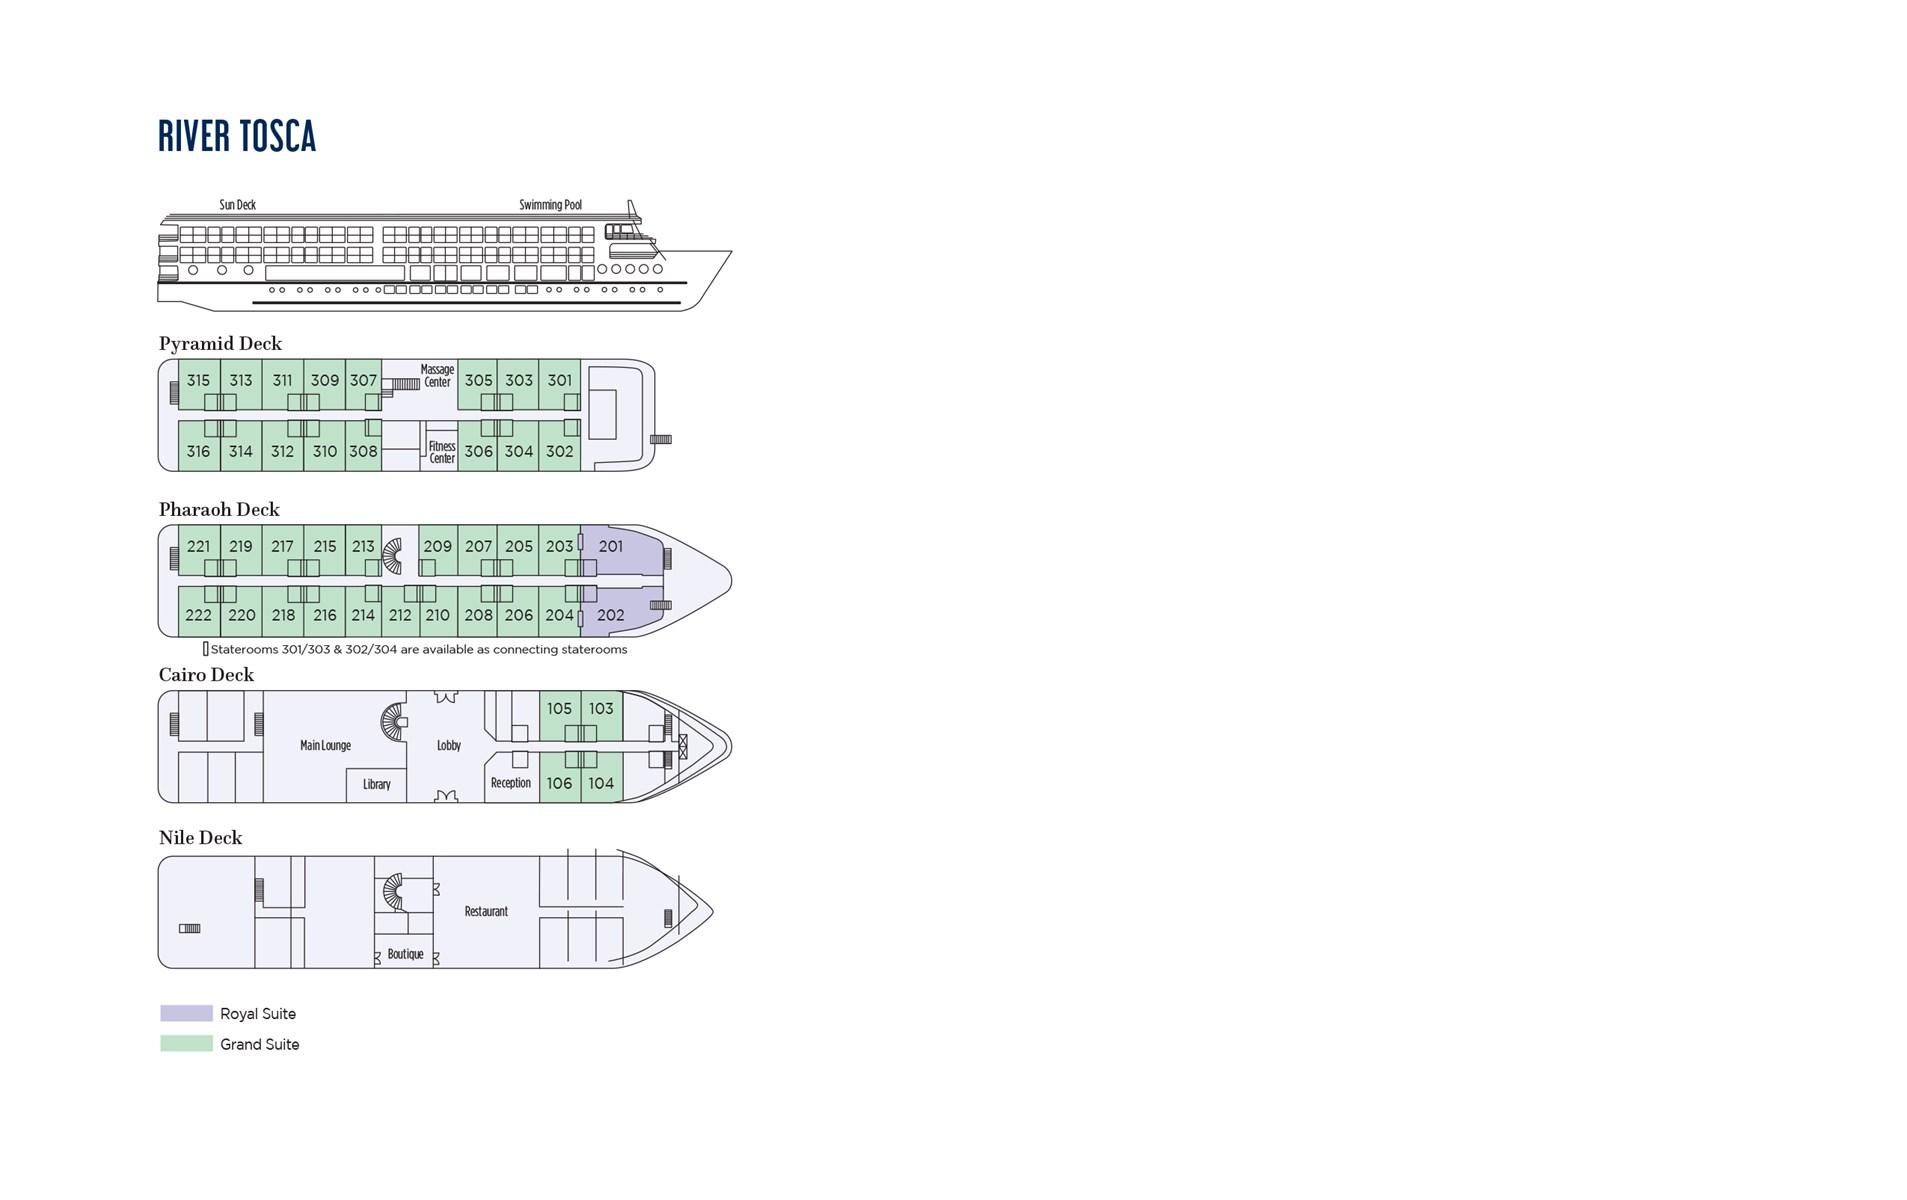 River Tosca Deck Plan